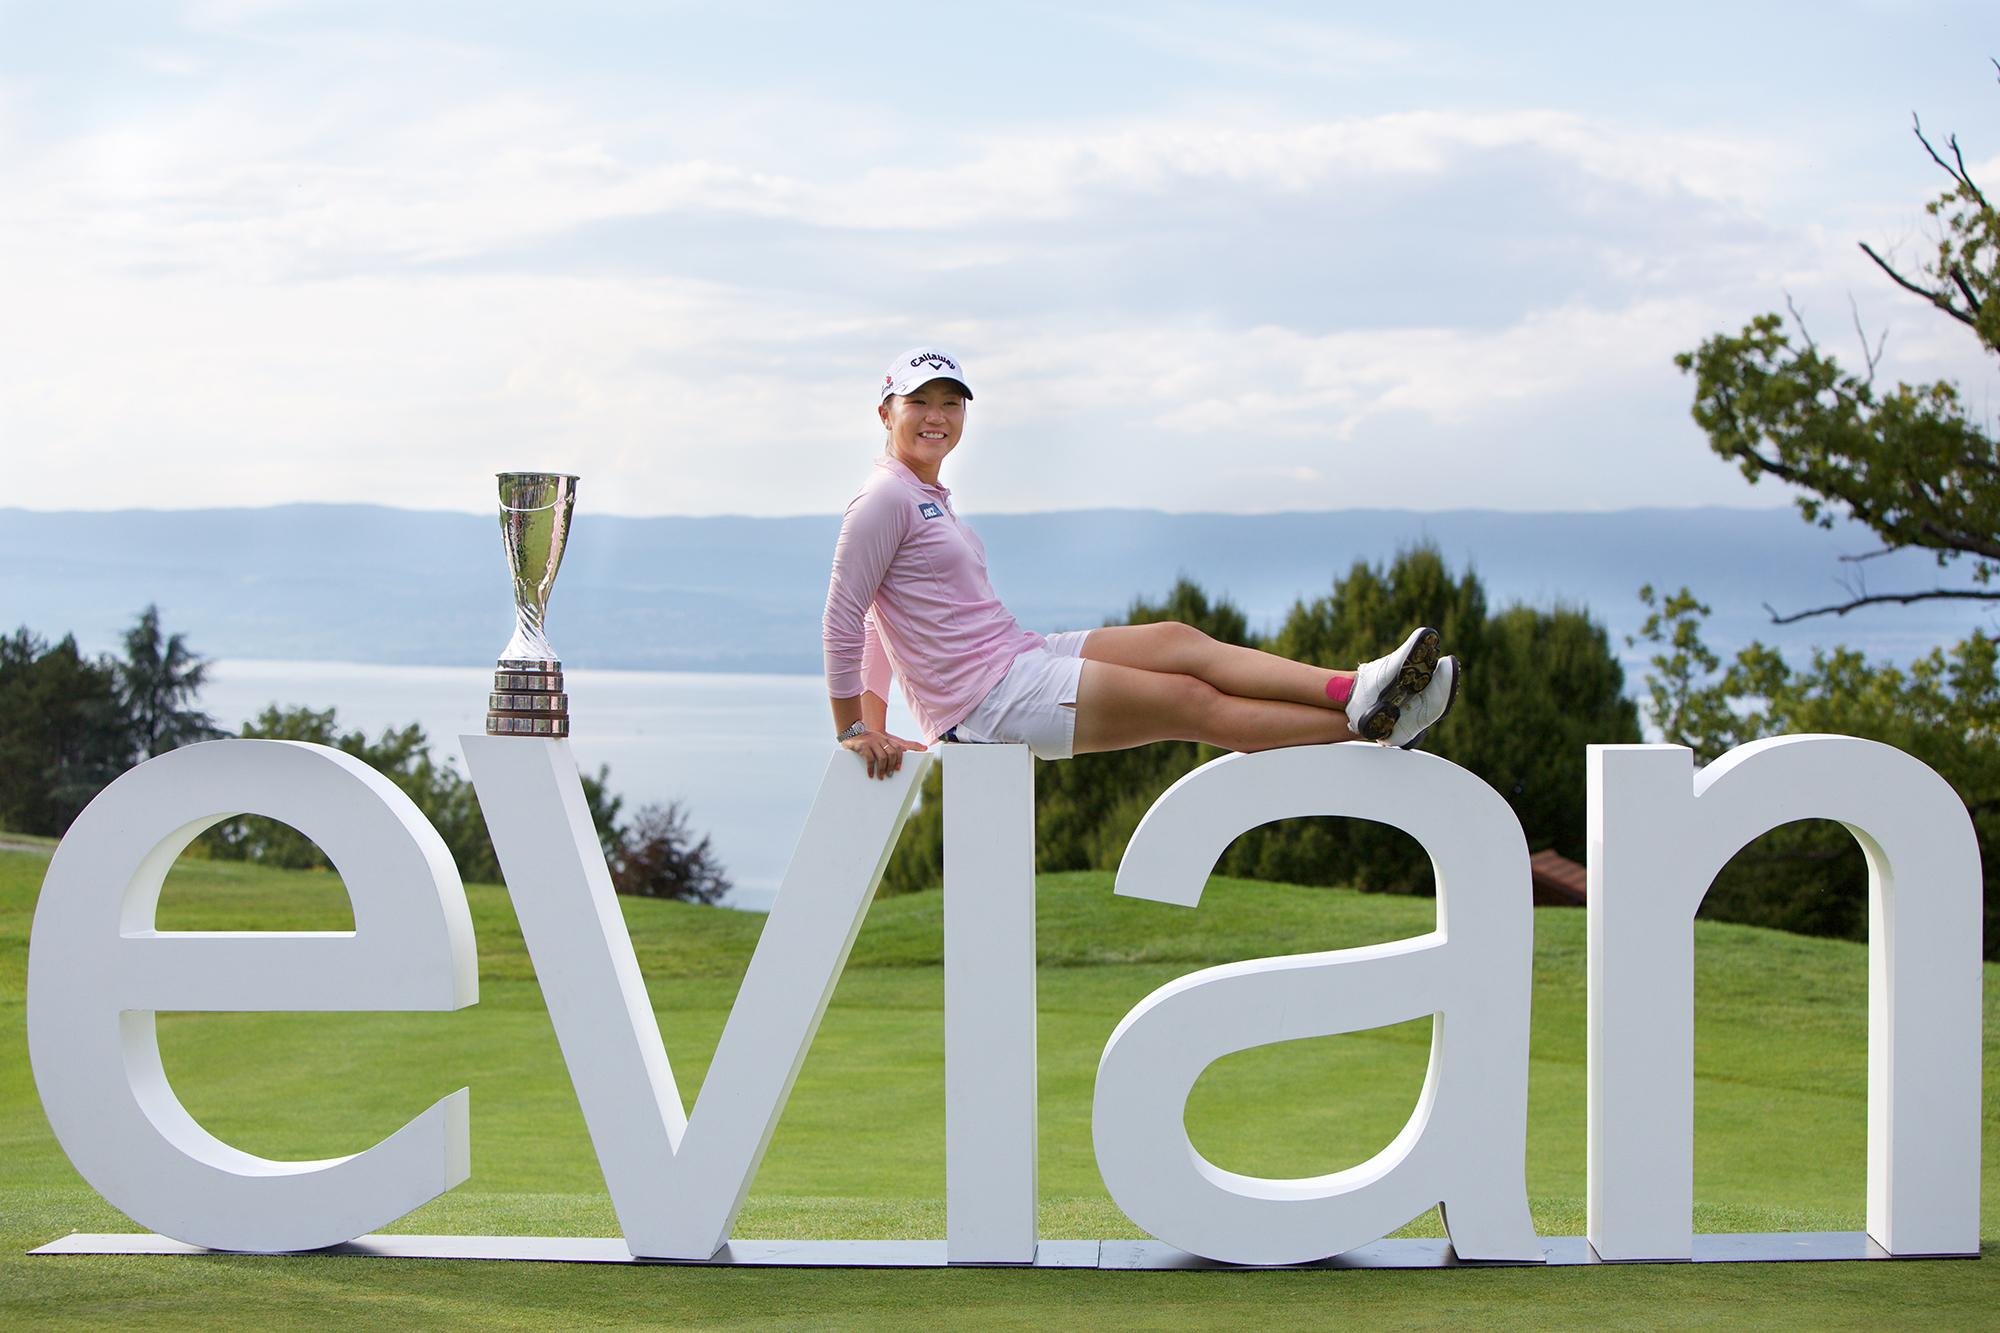 Lydia Ko evian sponsor golf